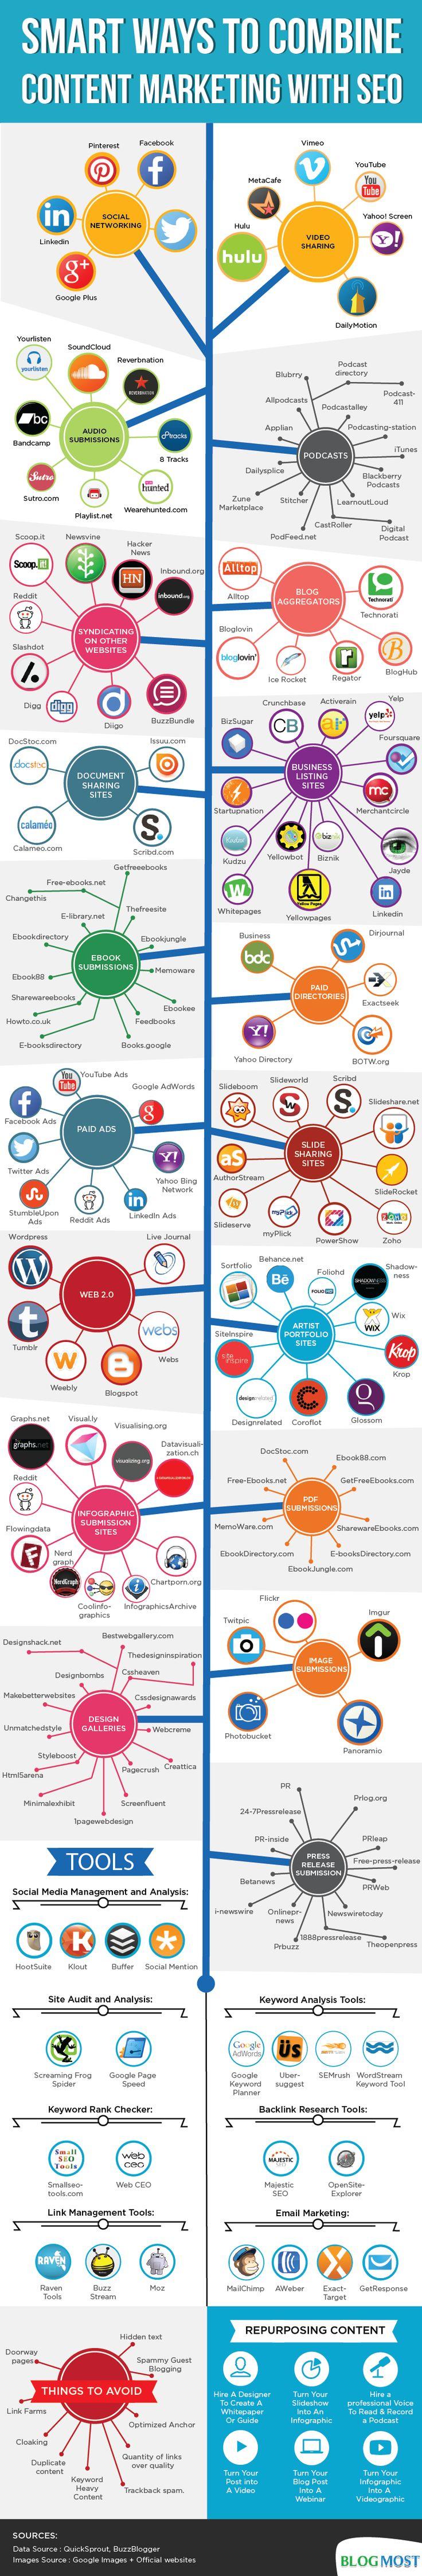 Smart ways to combine content marketing with SEO #infografia #infographic #marketing #seo